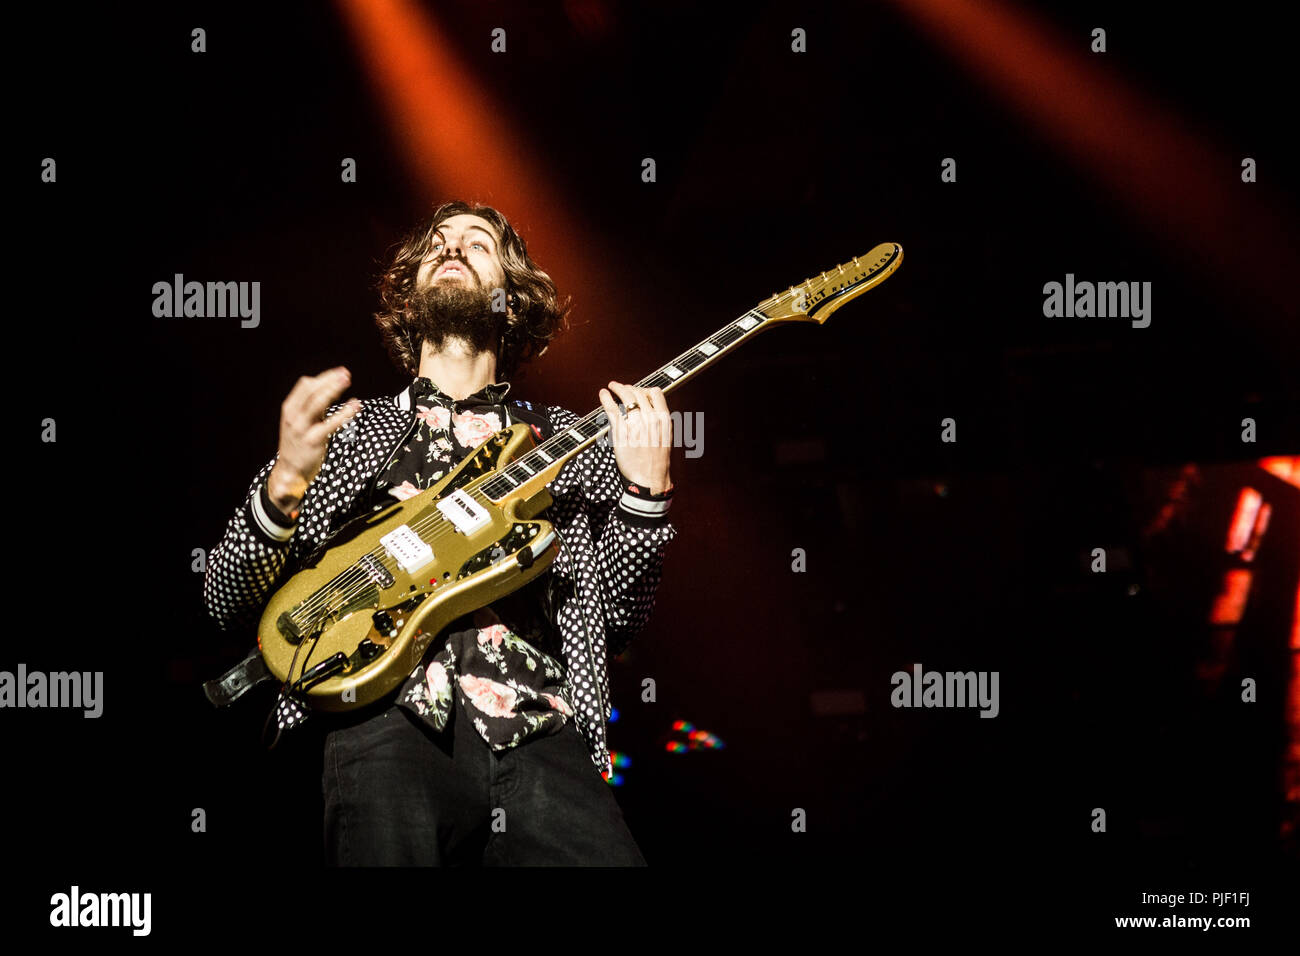 Rho Milan Italy 6 september 2018 Imagine Dragons live at Milano Rocksl 2018 at Area Expo Experience © Roberto Finizio / Alamy Credit: Roberto Finizio/Alamy Live News - Stock Image